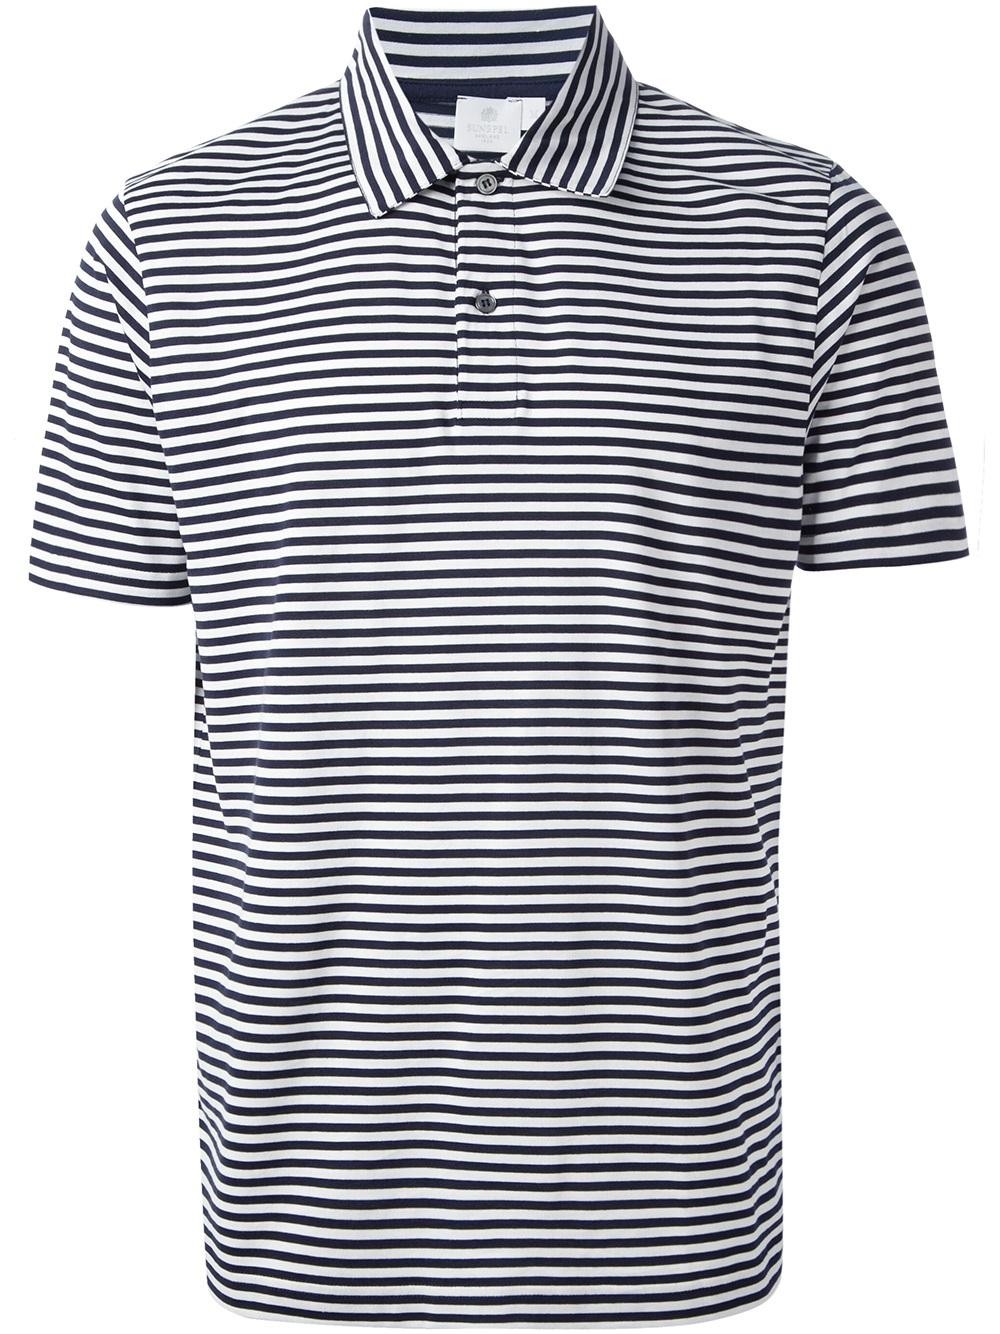 Lyst sunspel striped polo shirt in blue for men for Blue white striped t shirt mens